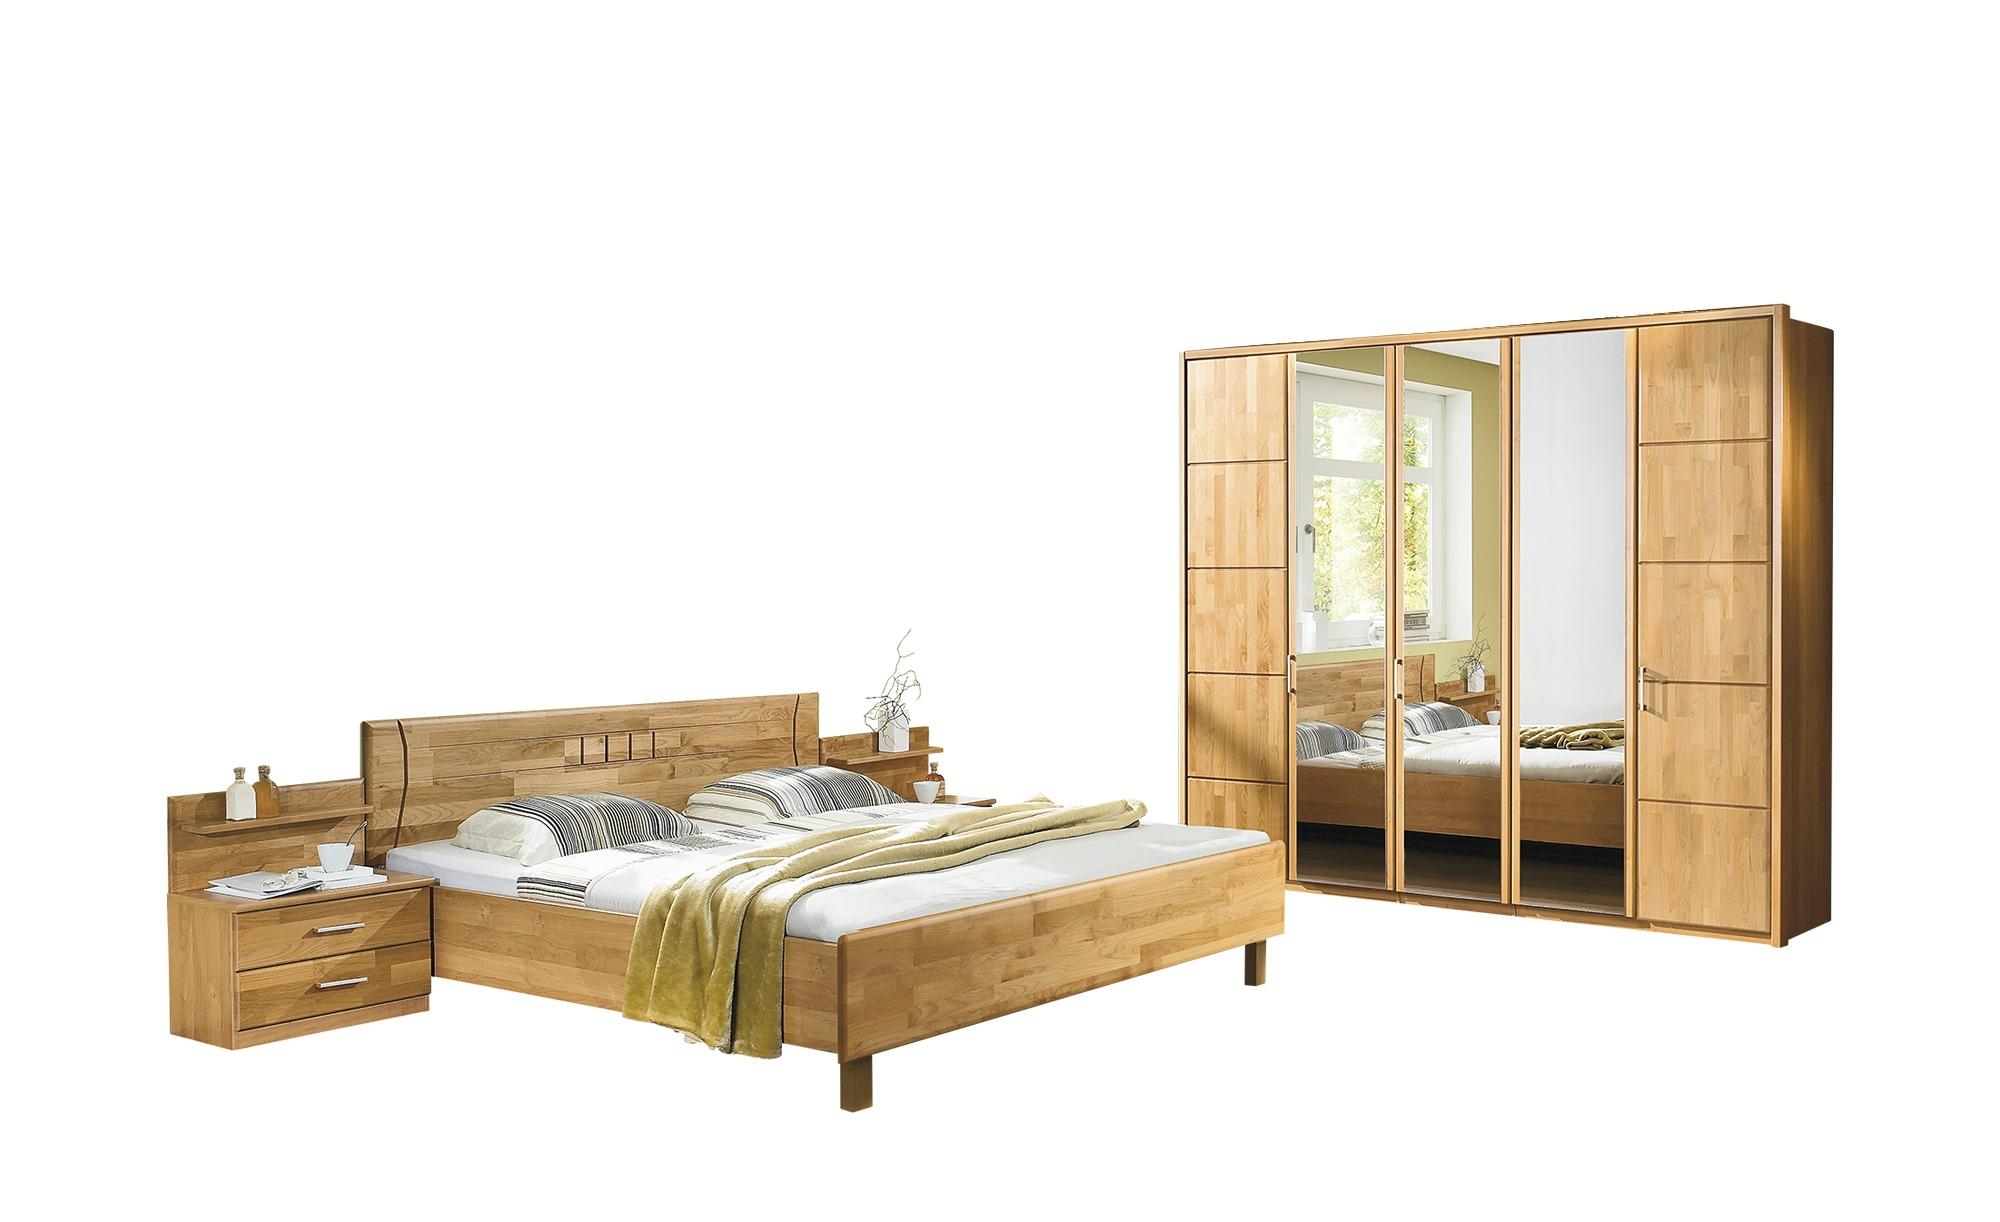 Woodford Komplett-Schlafzimmer 3-teilig Belisa - holzfarben - 256 cm - 216  cm - 58 cm - Komplett-Schlafzimmer - Möbel Kraft